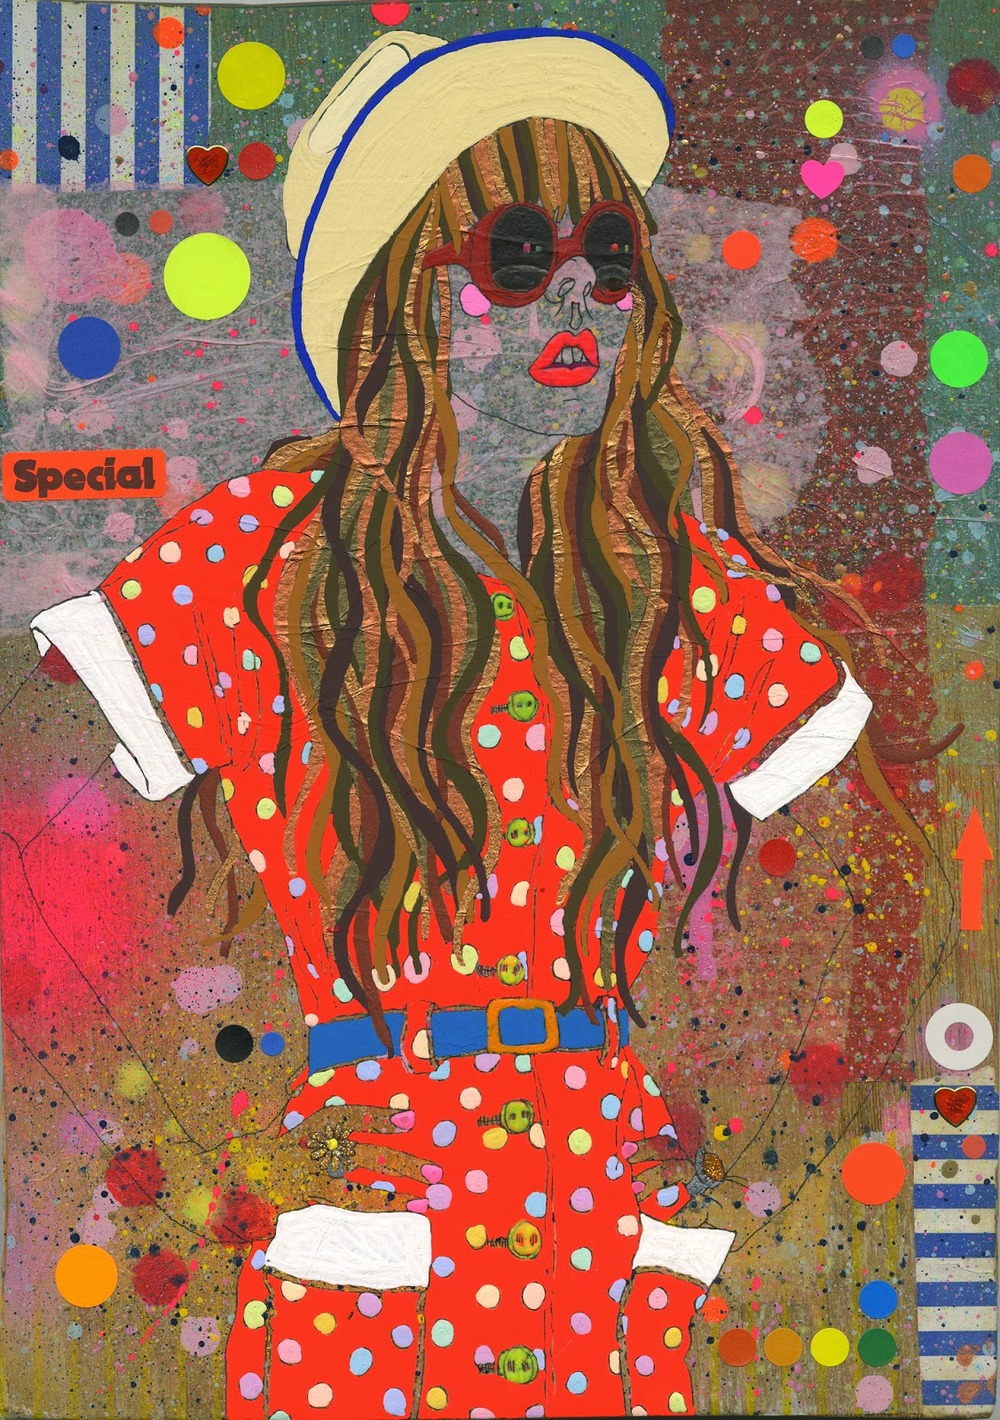 Steph-polka-dot-dress.jpg